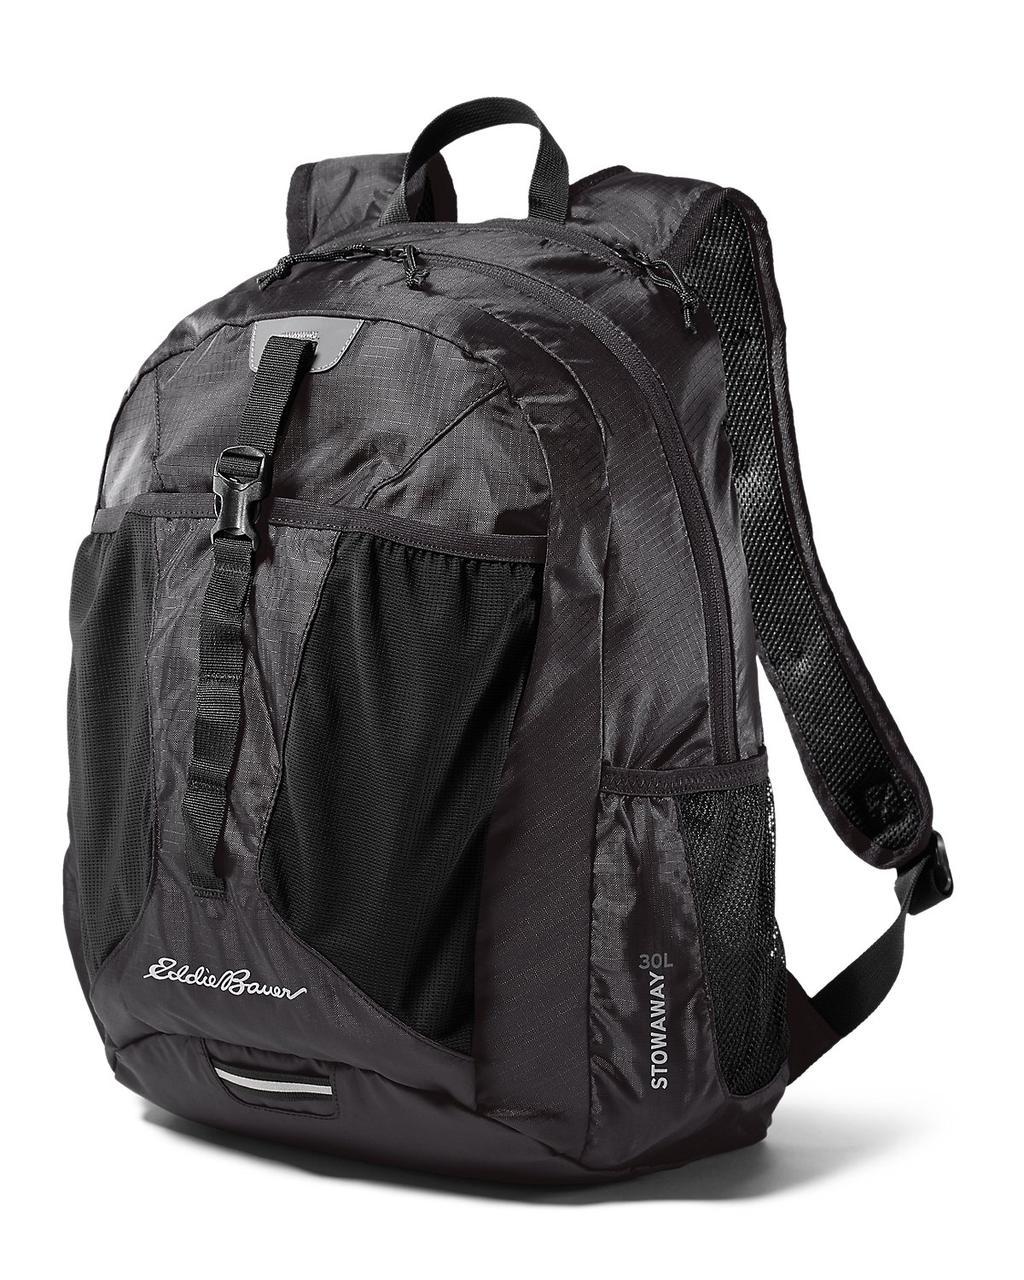 Рюкзак Eddie Bauer Stowaway Packable Backpack 30L Onyx